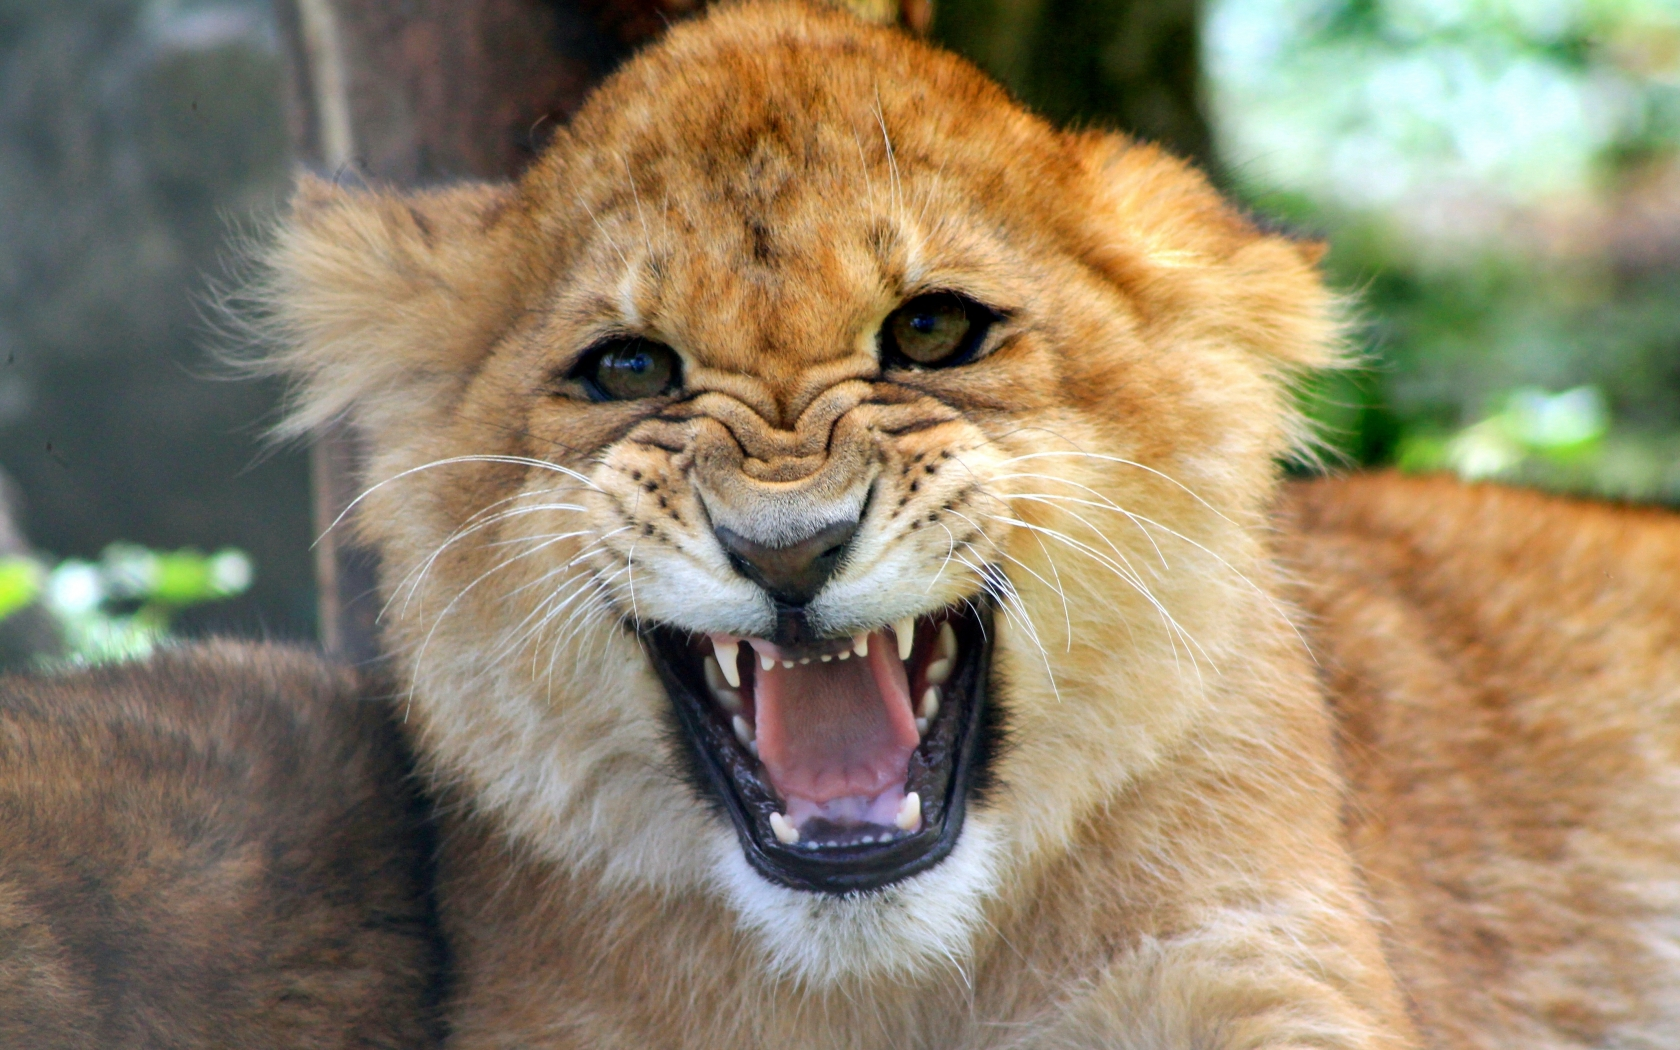 Cachorro león rugiendo - 1680x1050